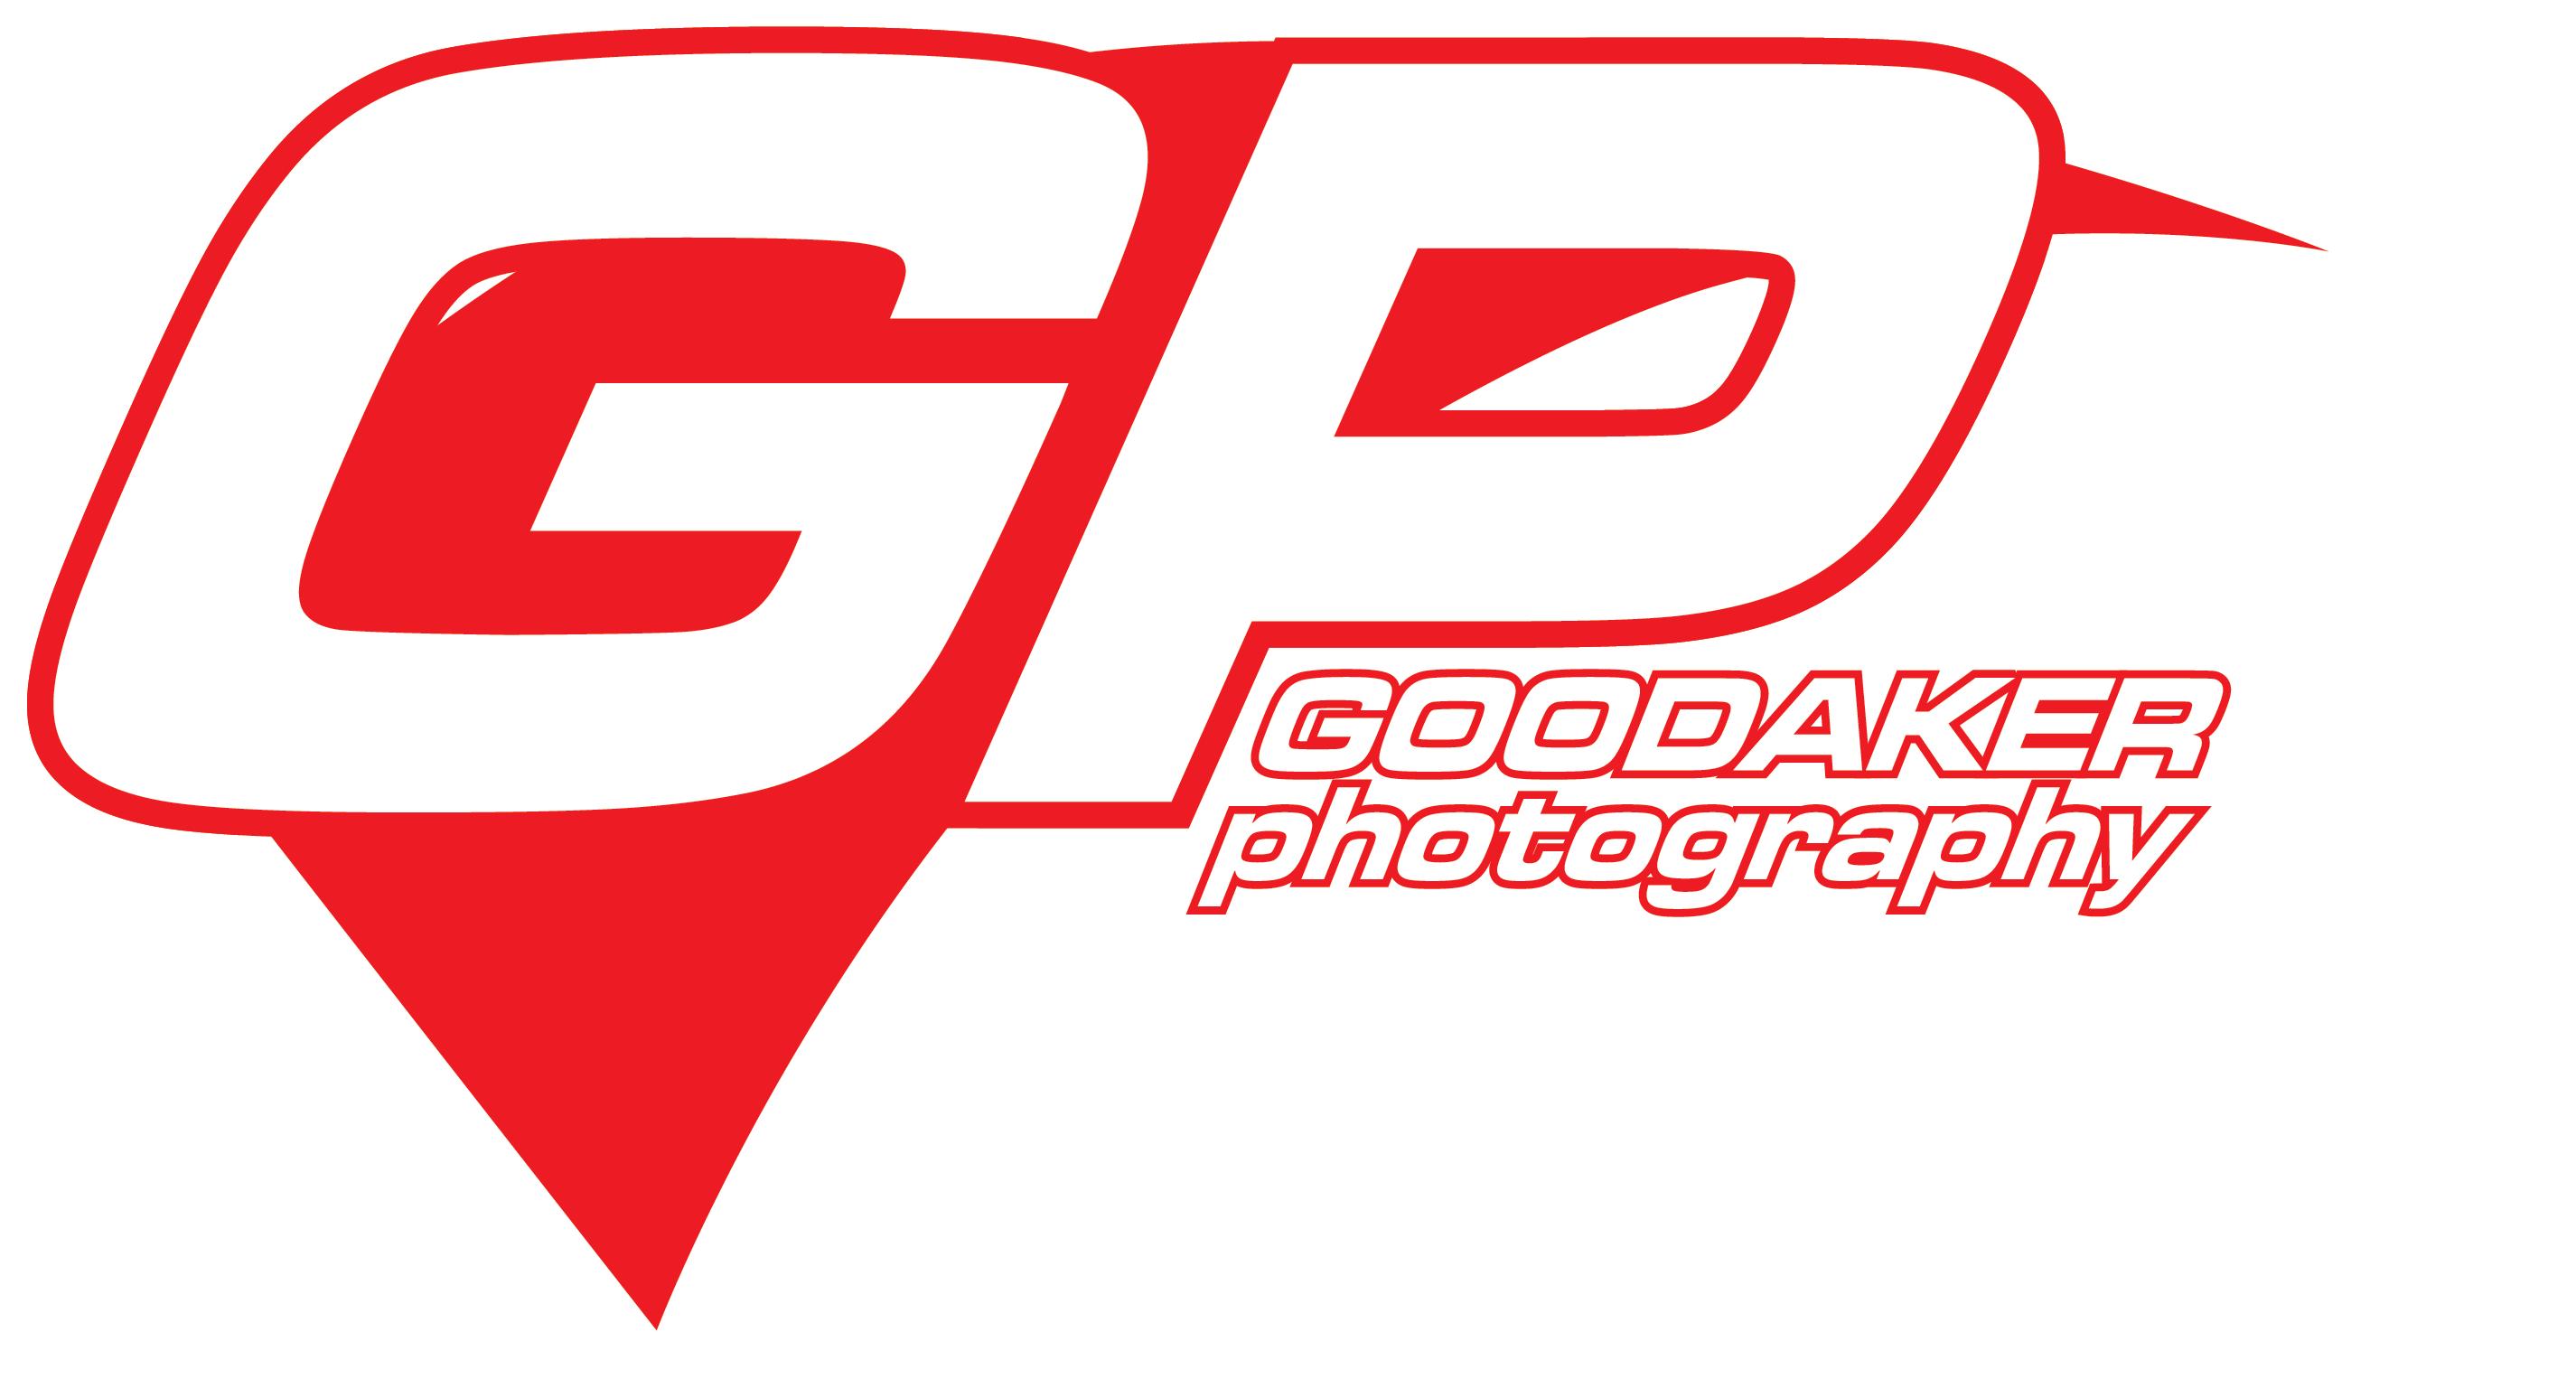 Goodaker Photography